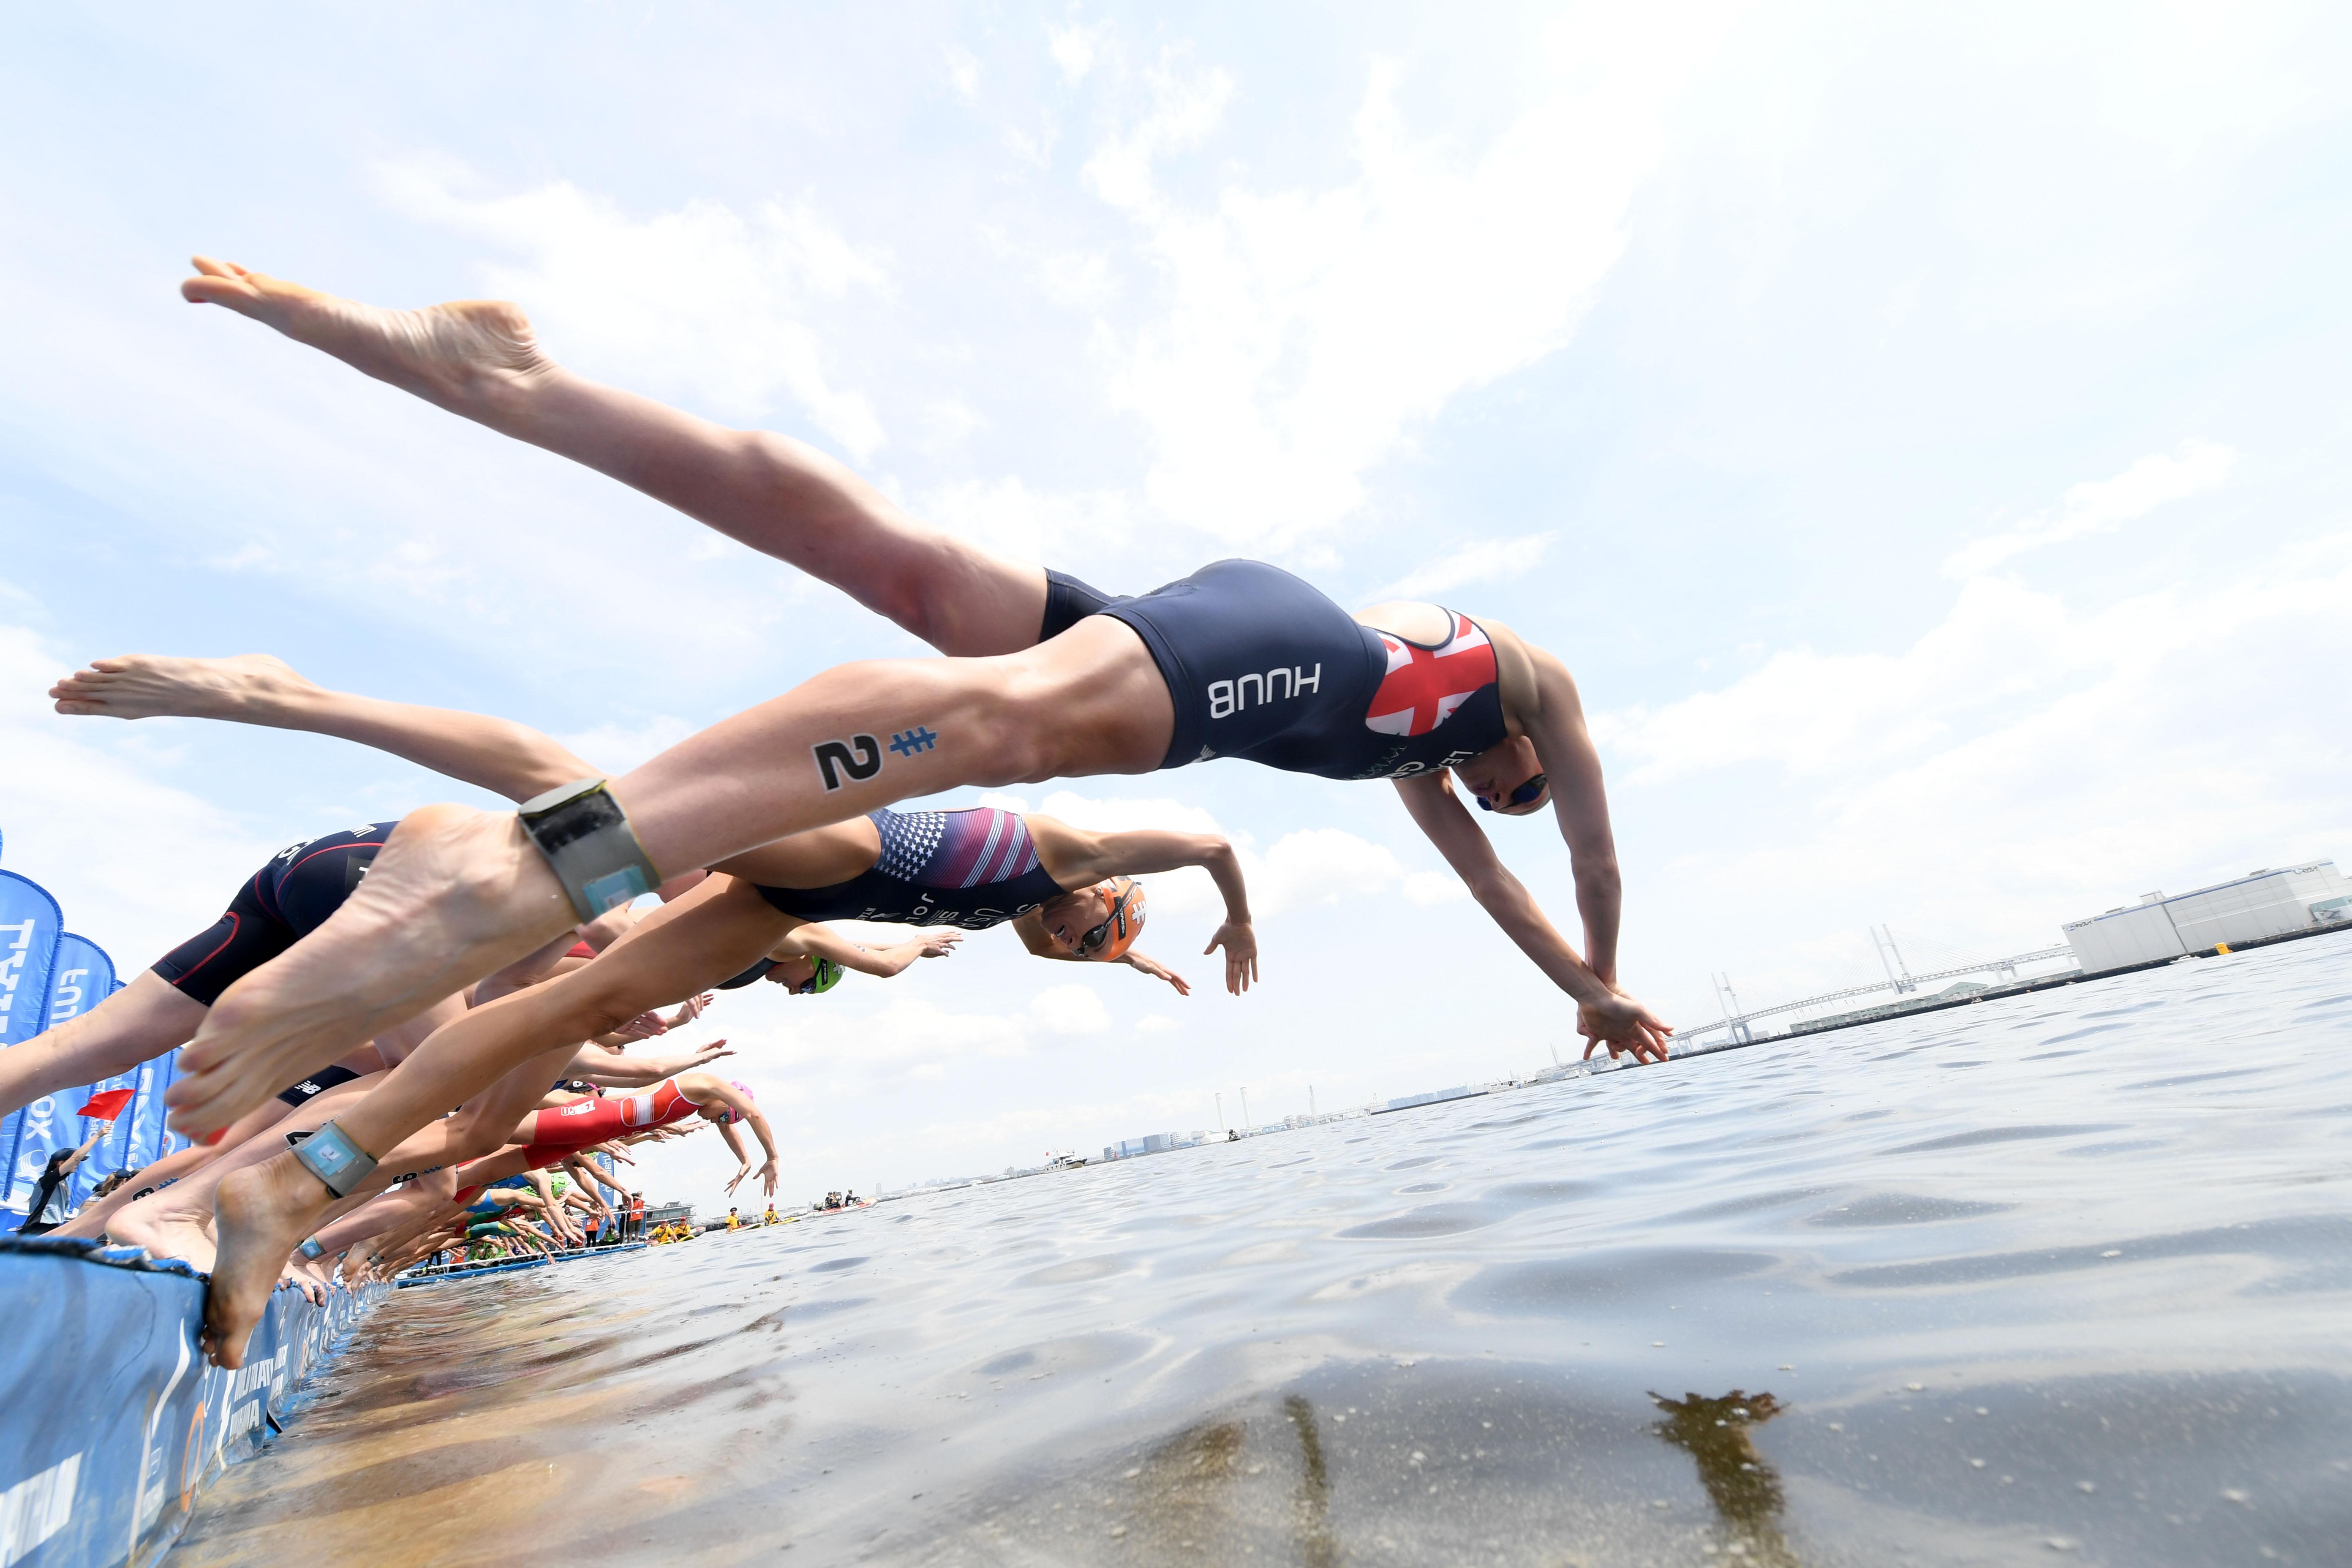 Calendario For Mens 2020.Itu Announces The 2020 World Triathlon Series Calendar